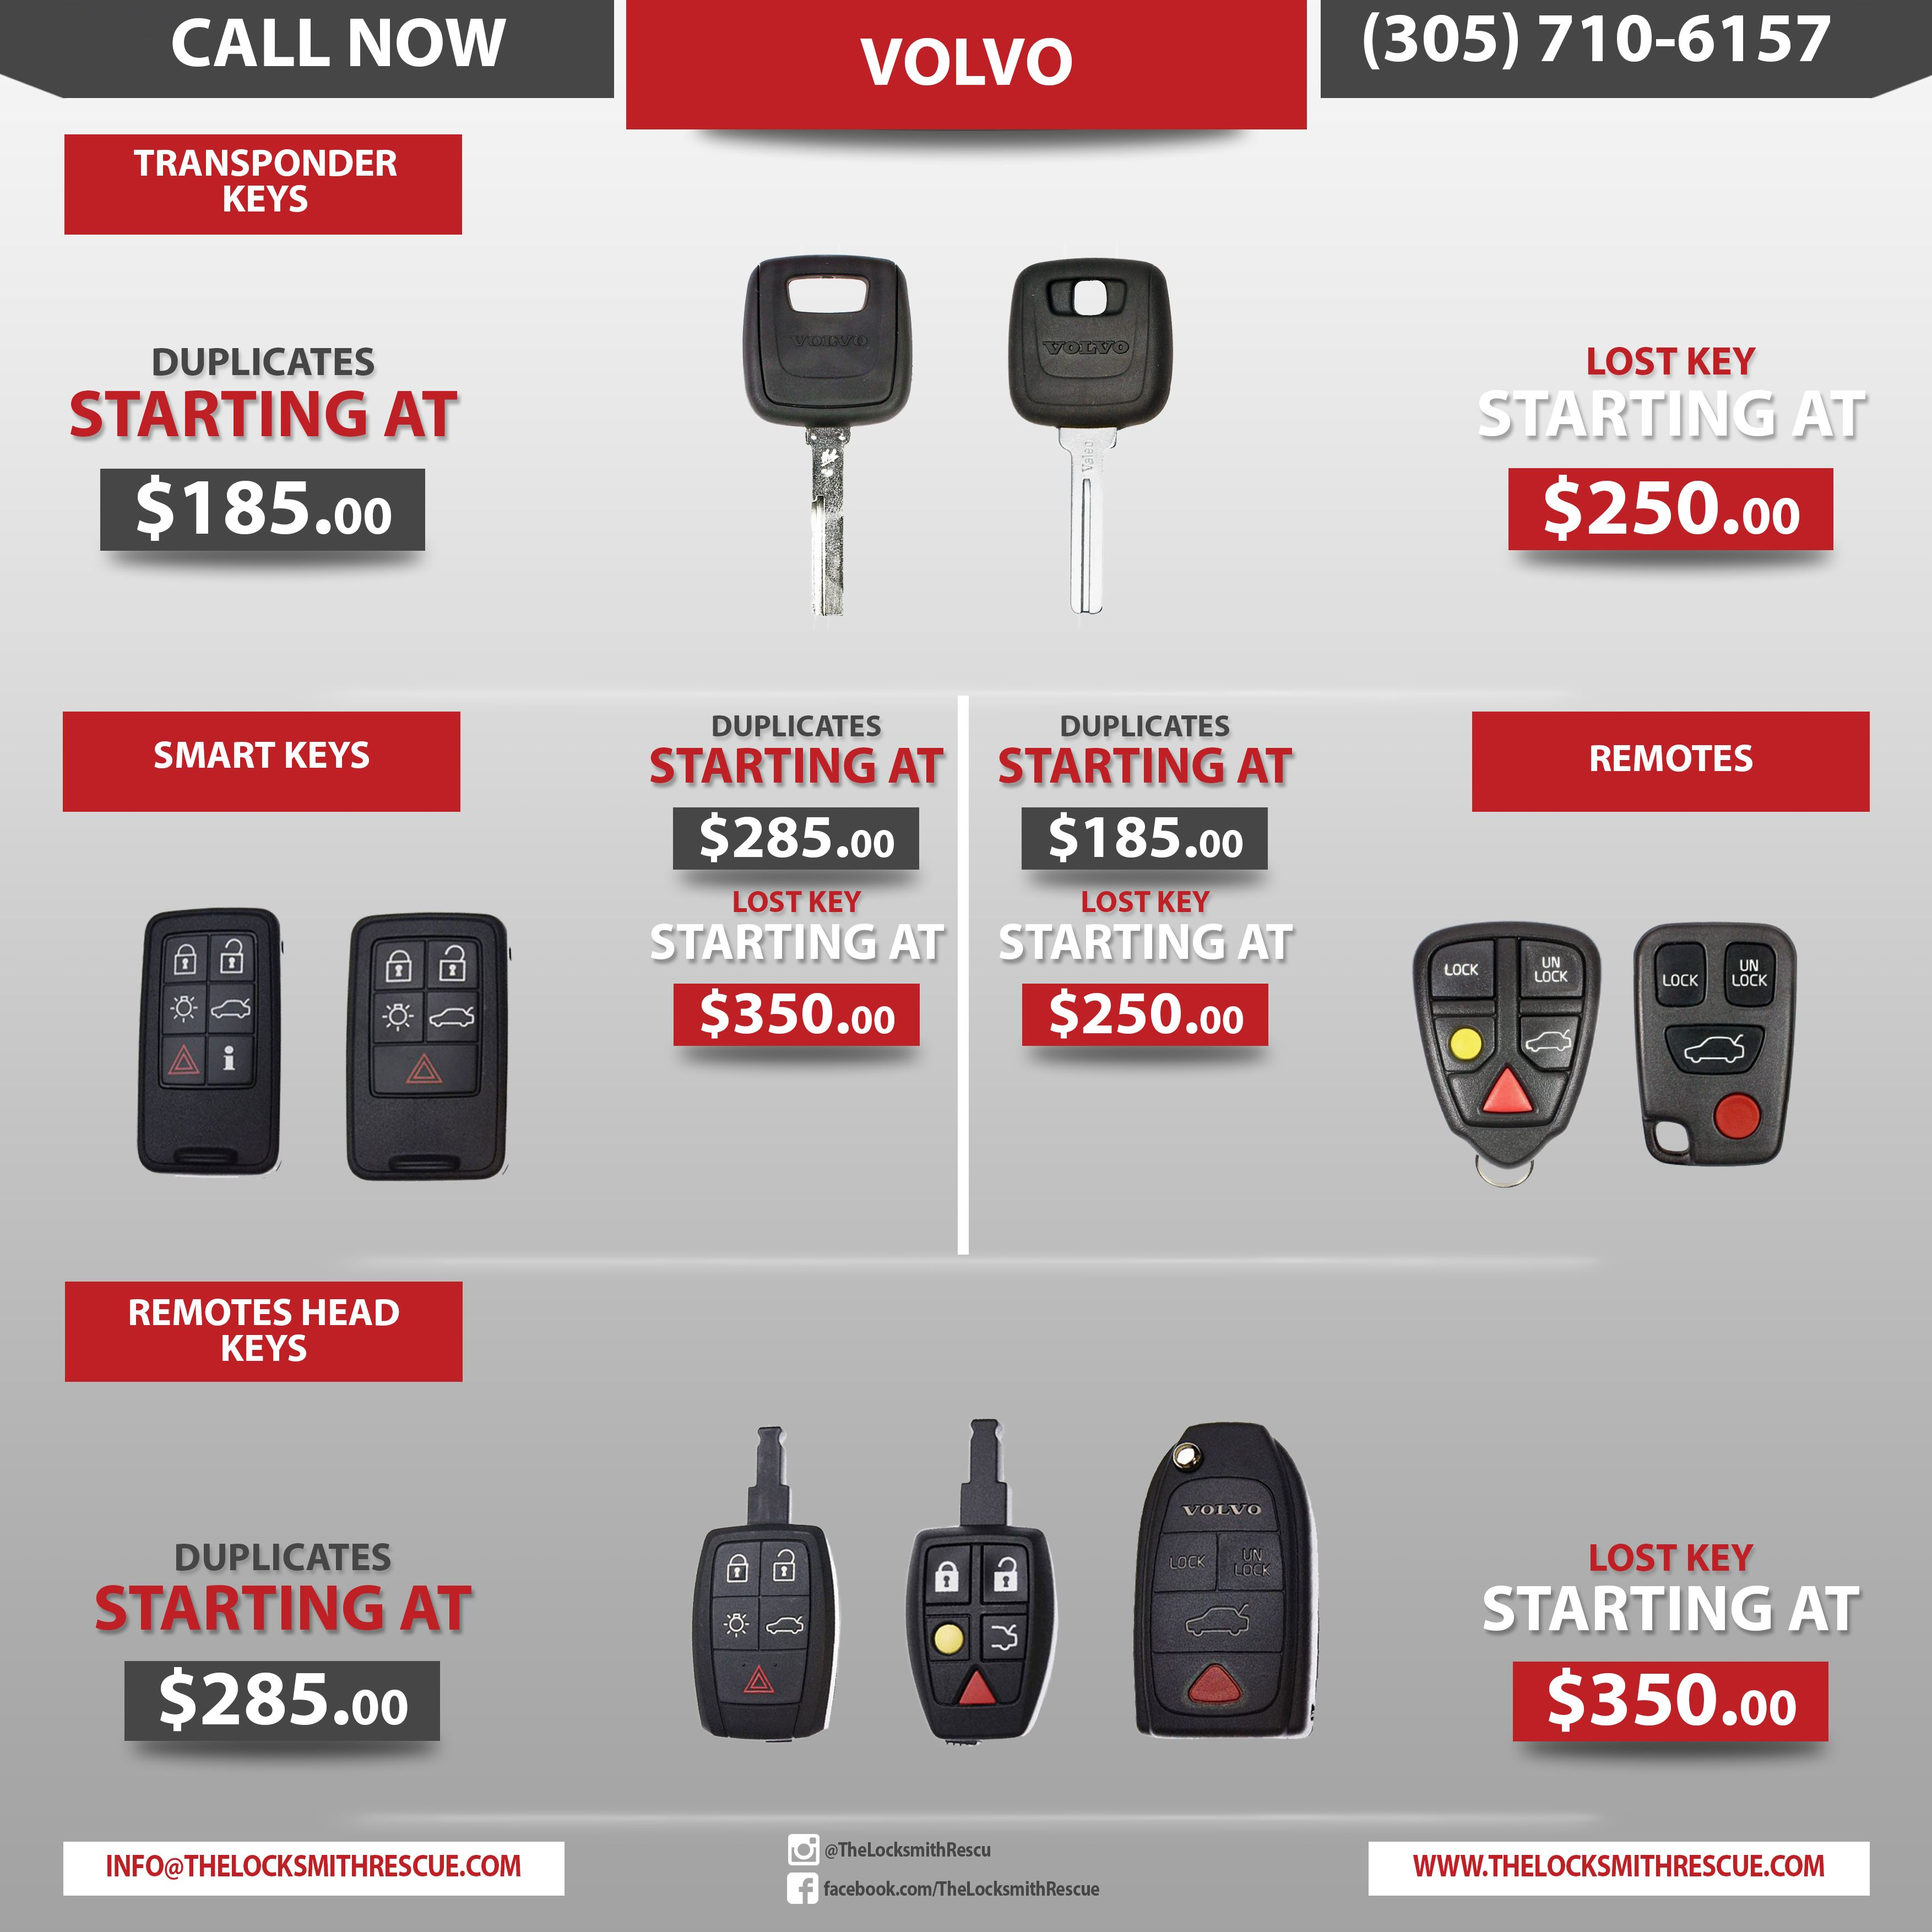 We Bring The Best Price In The Market For All Types Of Cars Keys Call Us Now Volvo Volvo240 Volvoxc90 Locksmith Locksmithser Lost Keys Smart Key Volvo